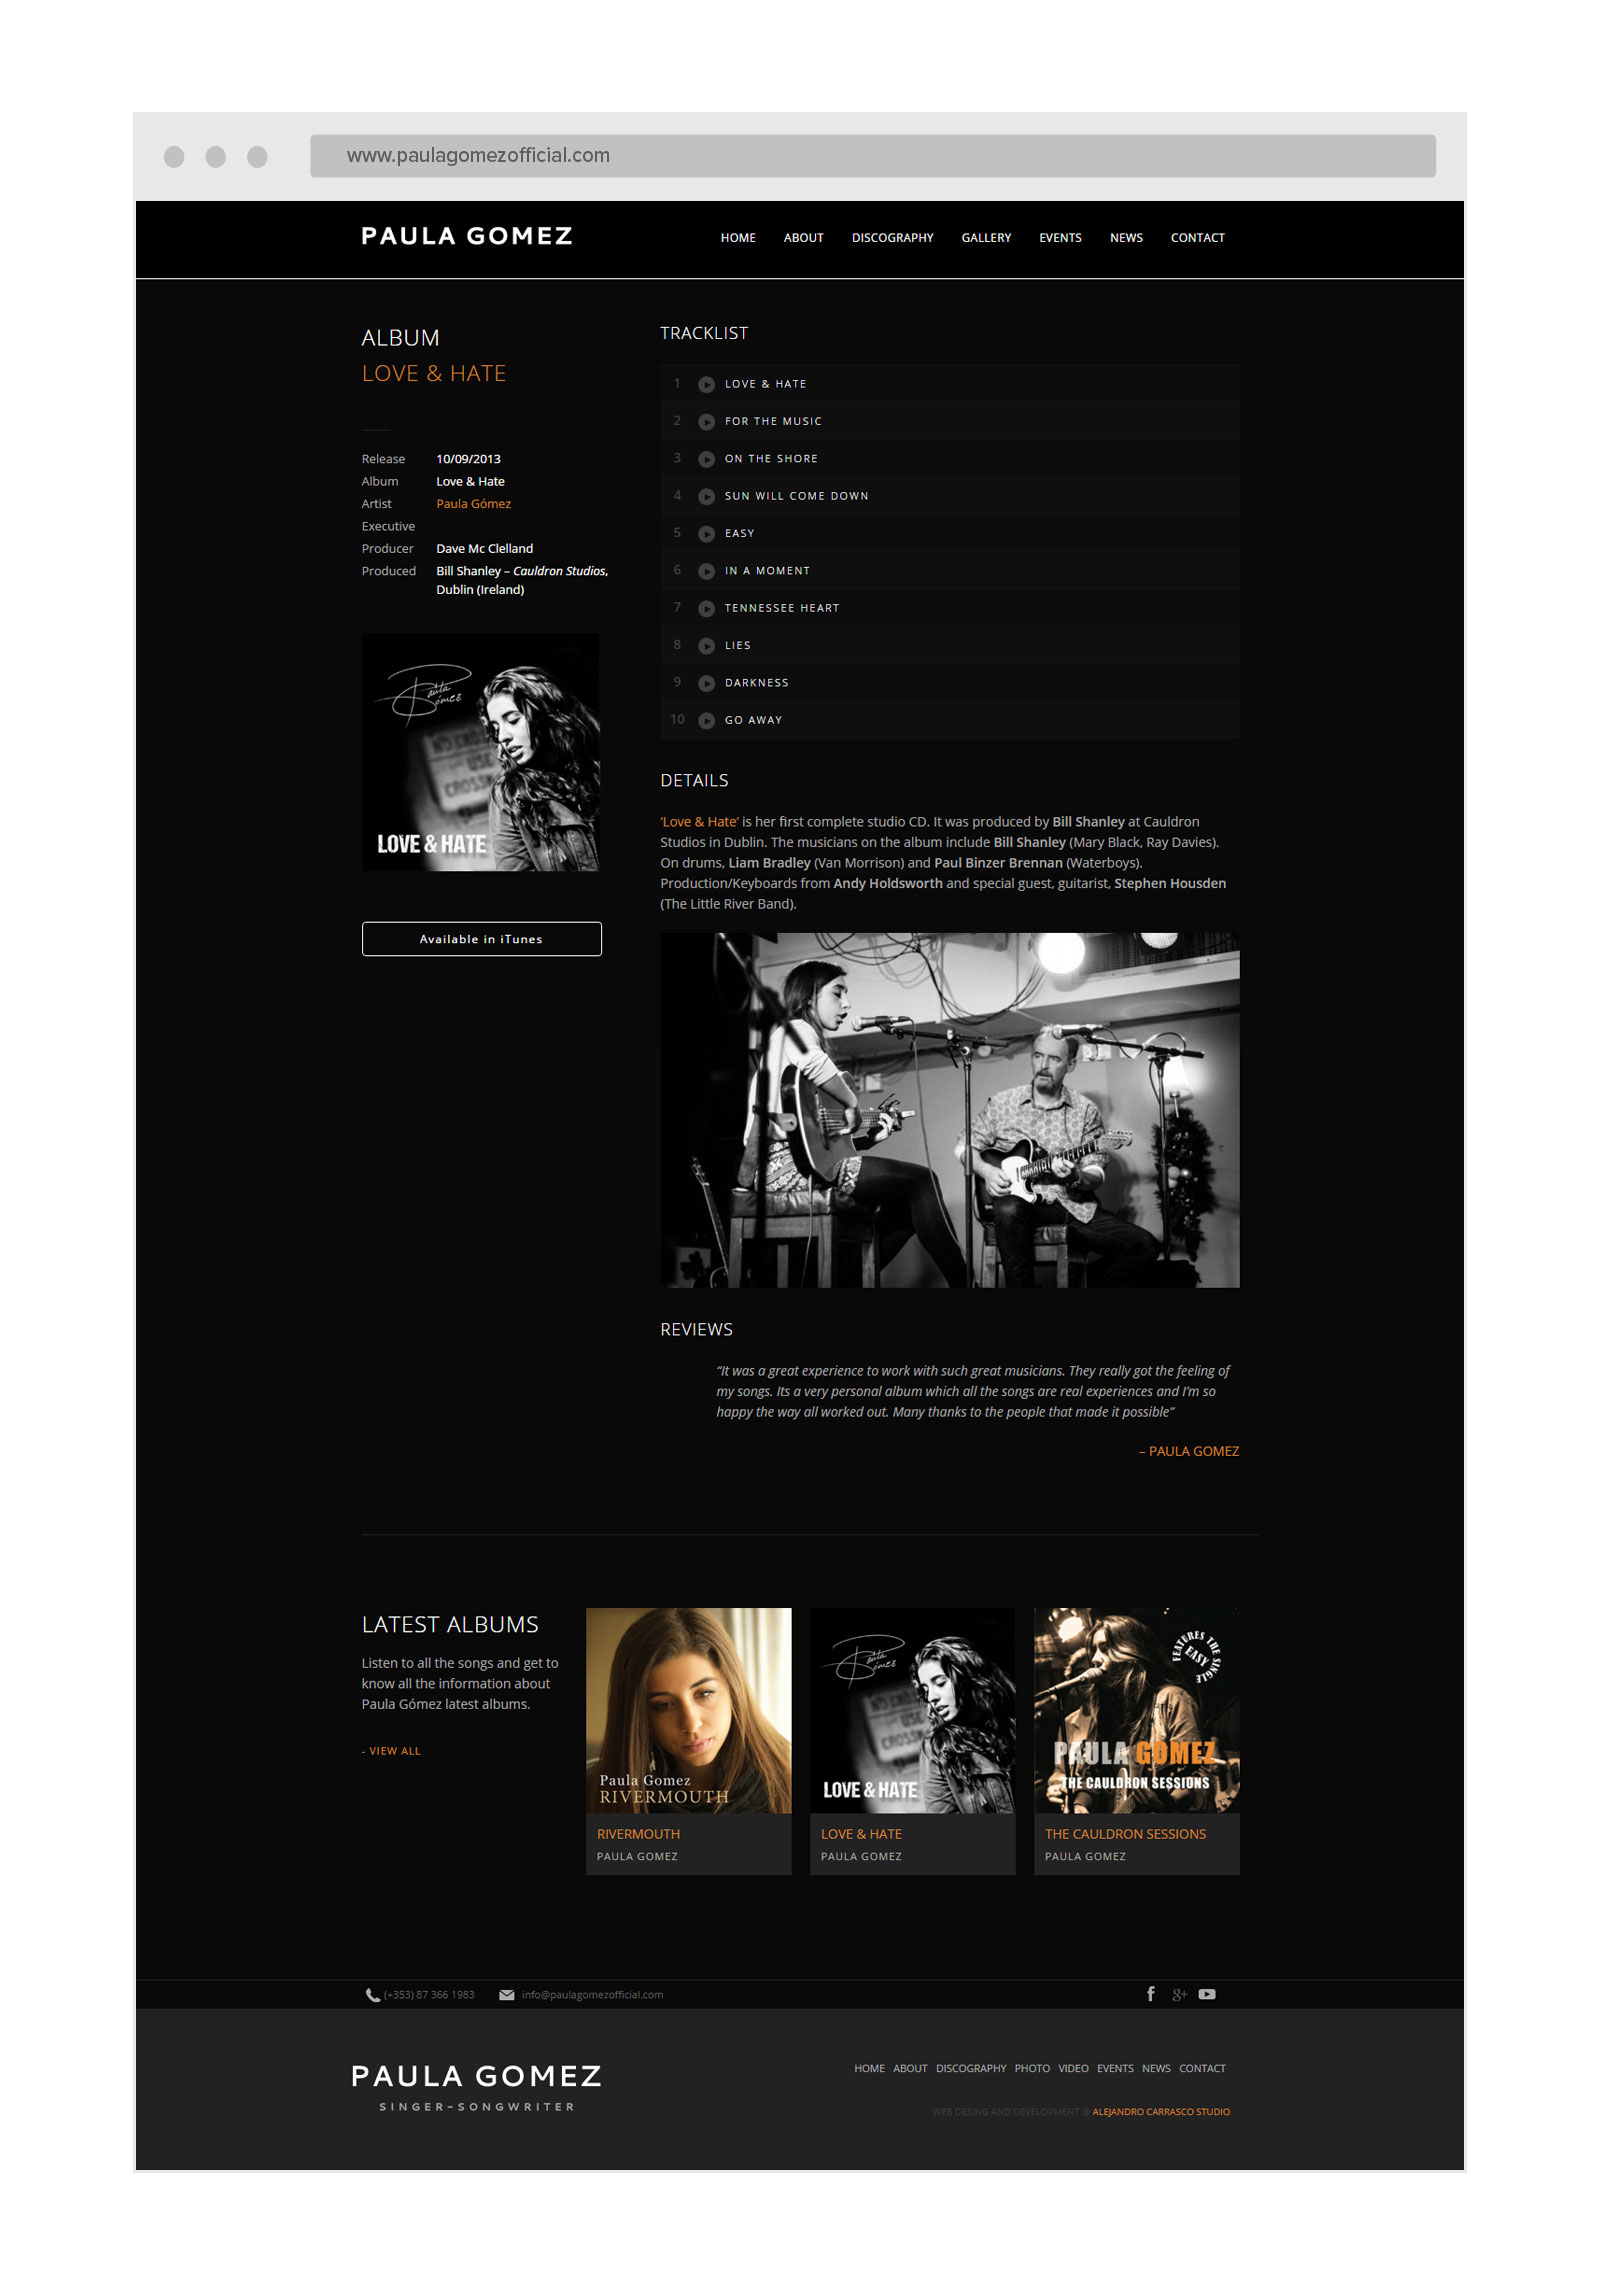 paula-gomez-website-02.jpg